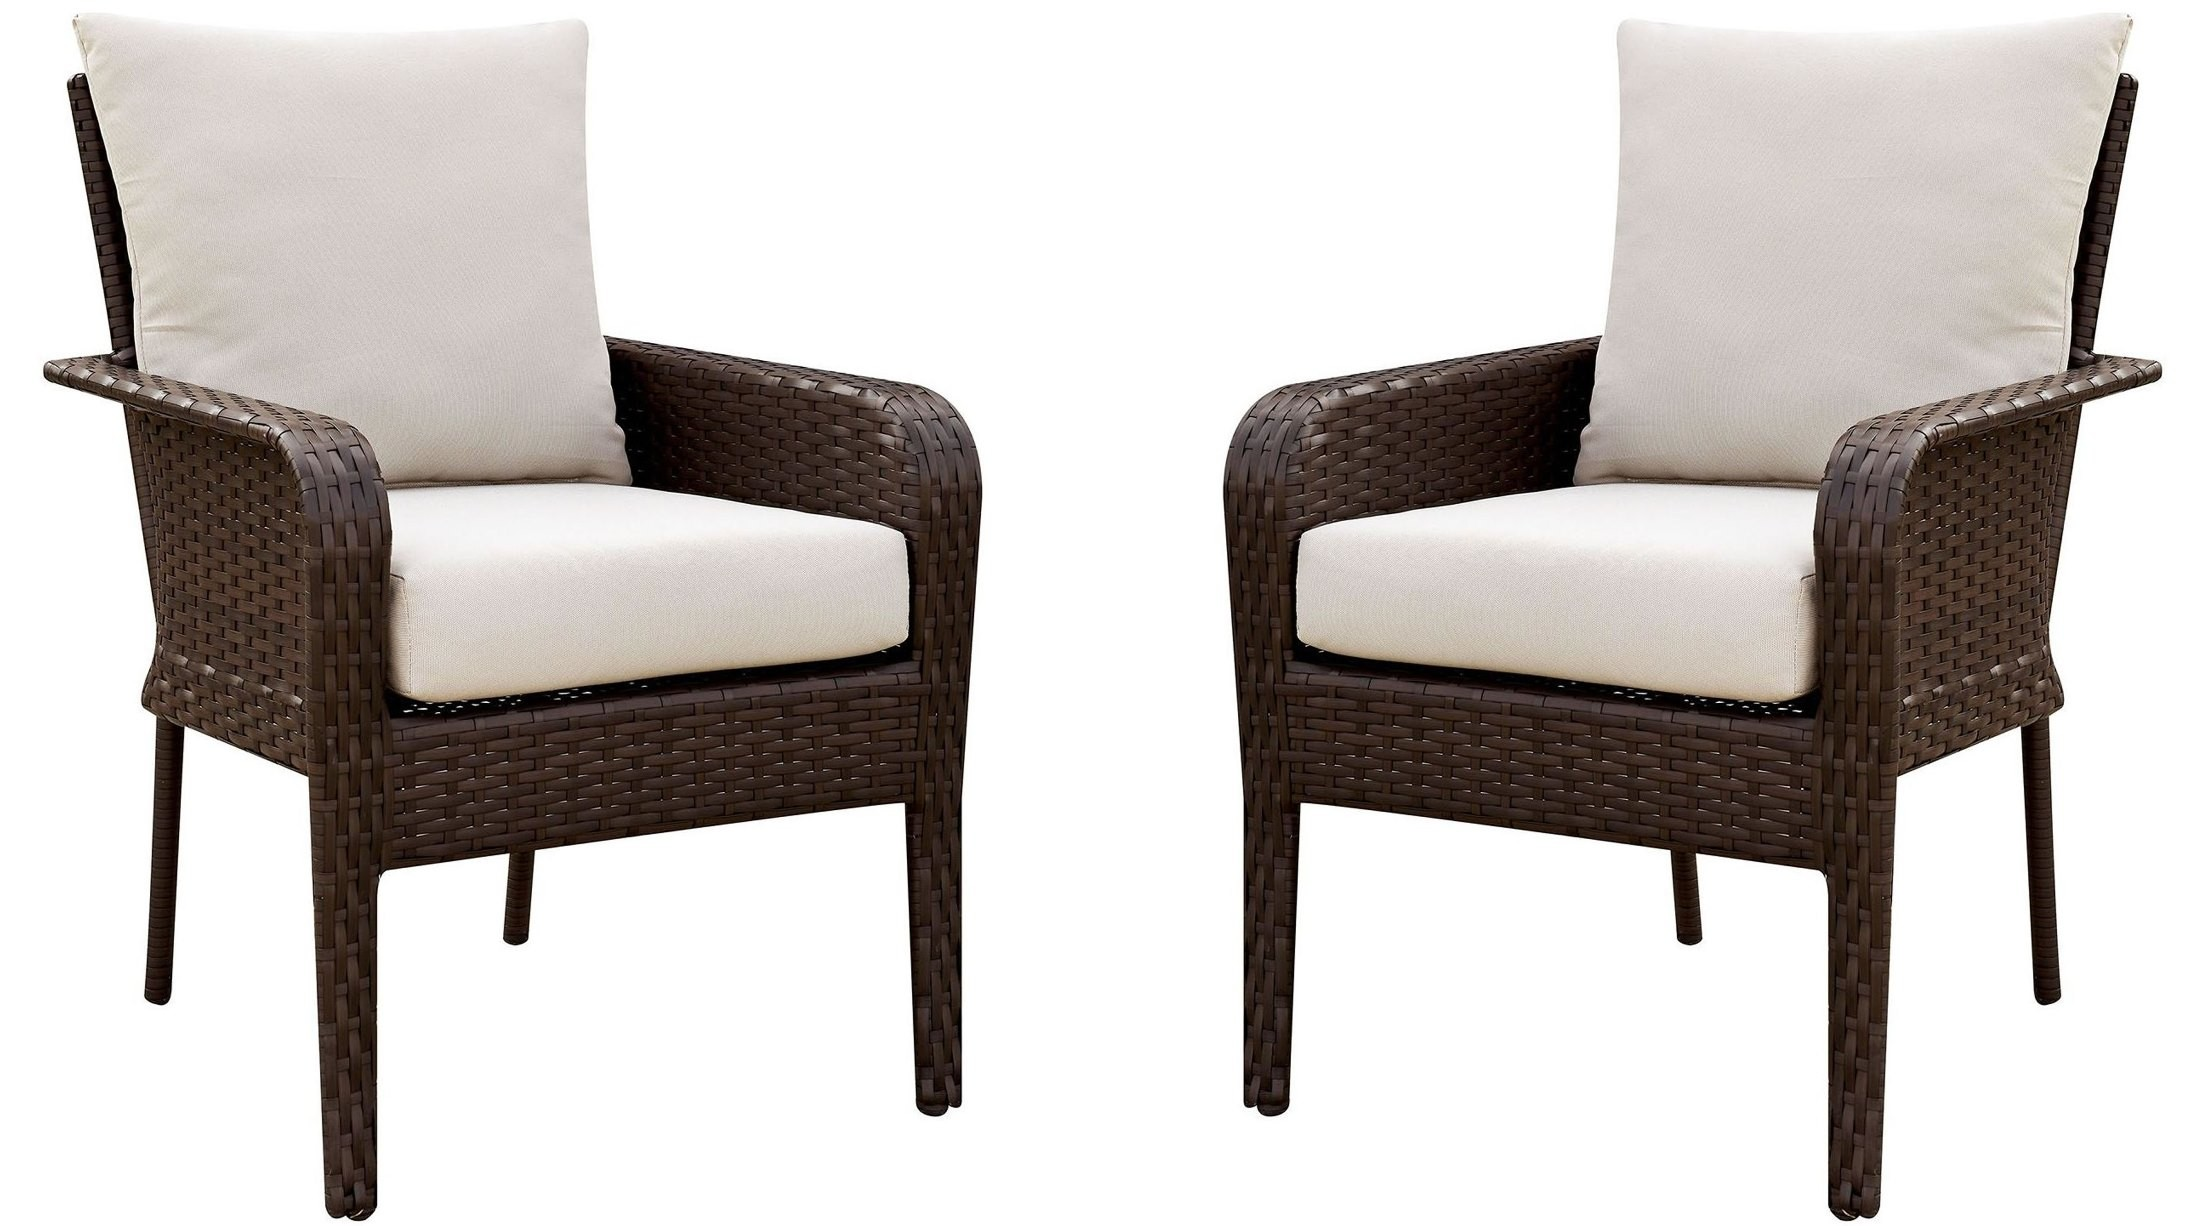 Shakira Ivory and Espresso Arm Chair Set Of 2 CM OT1849  : cm ot1849 ac wb1 from colemanfurniture.com size 2200 x 1226 jpeg 323kB